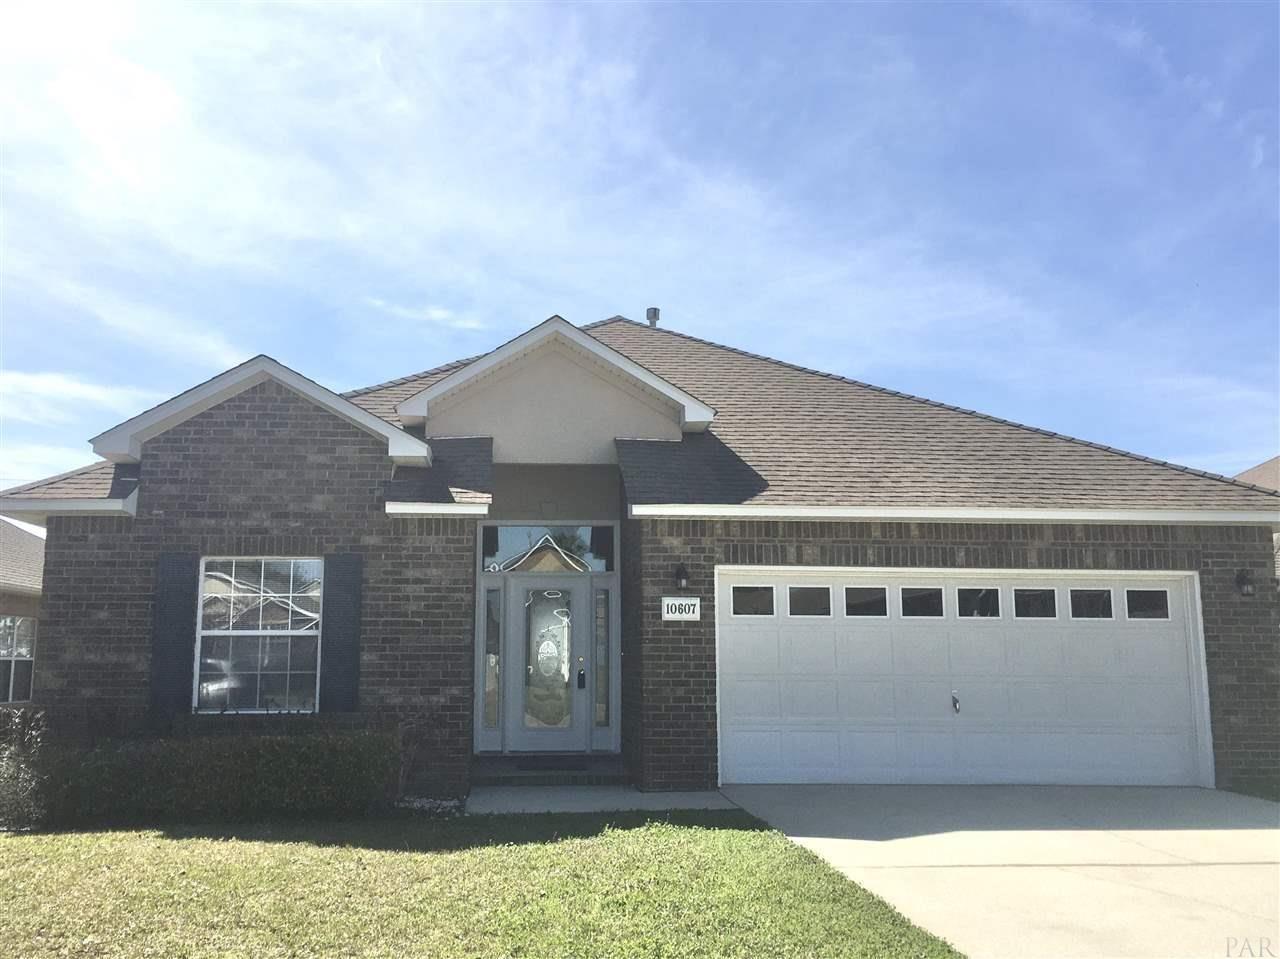 Property Image Of 10607 Santorini Ct In Pensacola, Fl